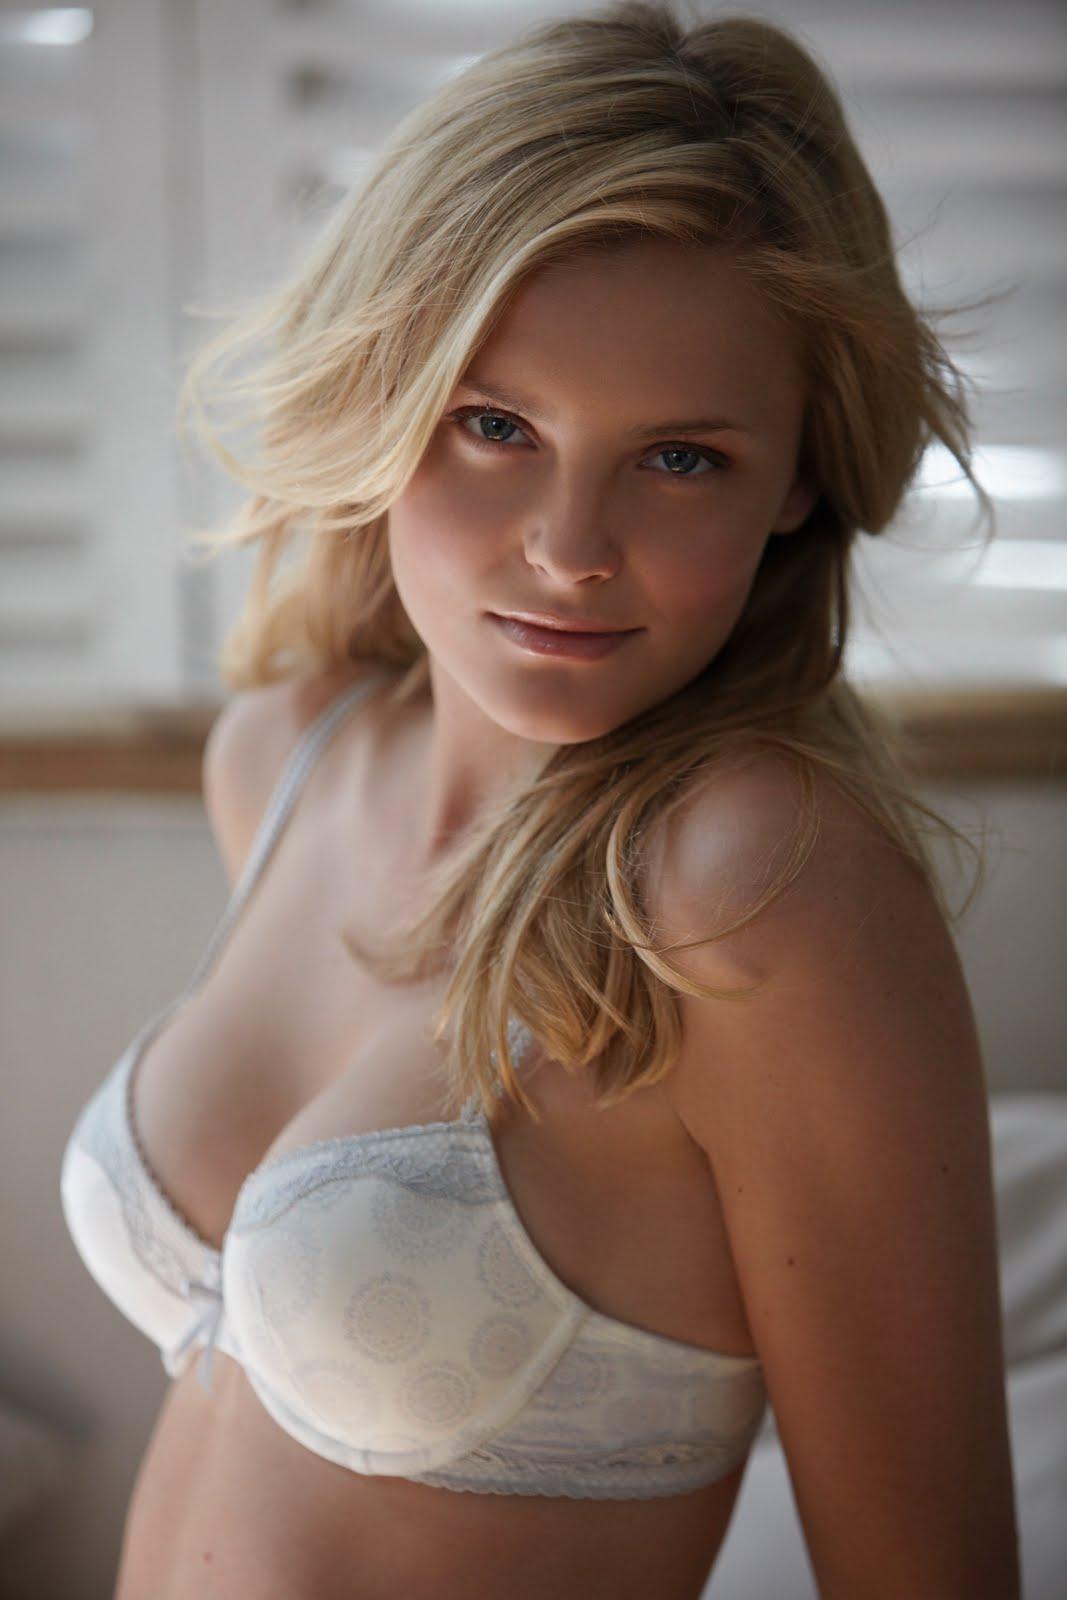 http://3.bp.blogspot.com/-xttB9L-hvEs/TmumI0hq9vI/AAAAAAAABVU/rIYFwp_qX_A/s1600/Petra_Silander_8.jpg